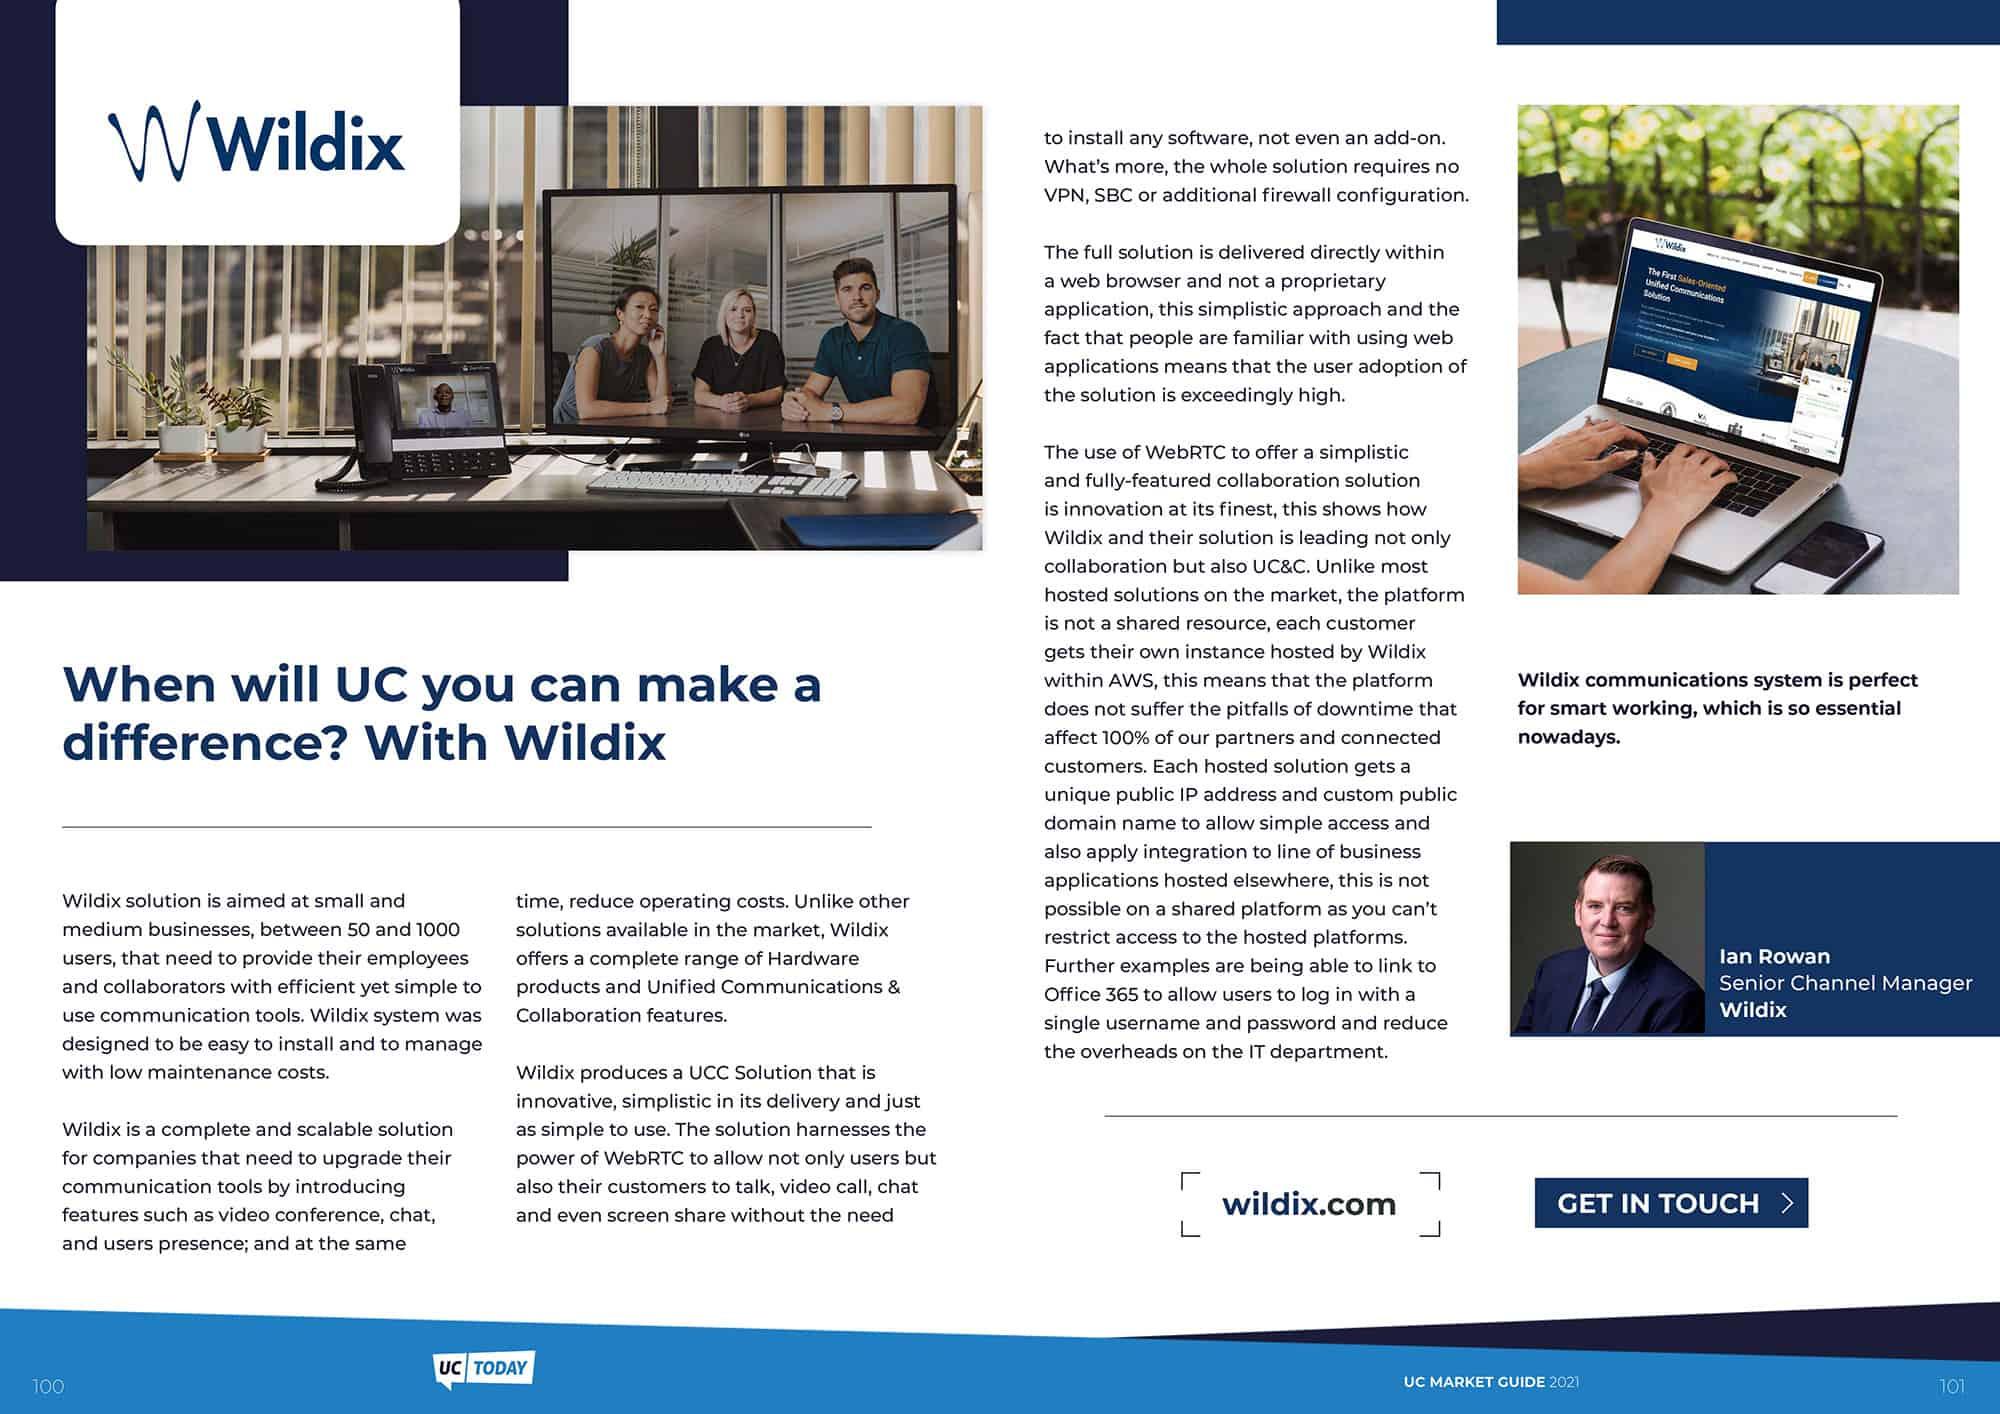 UC market guide